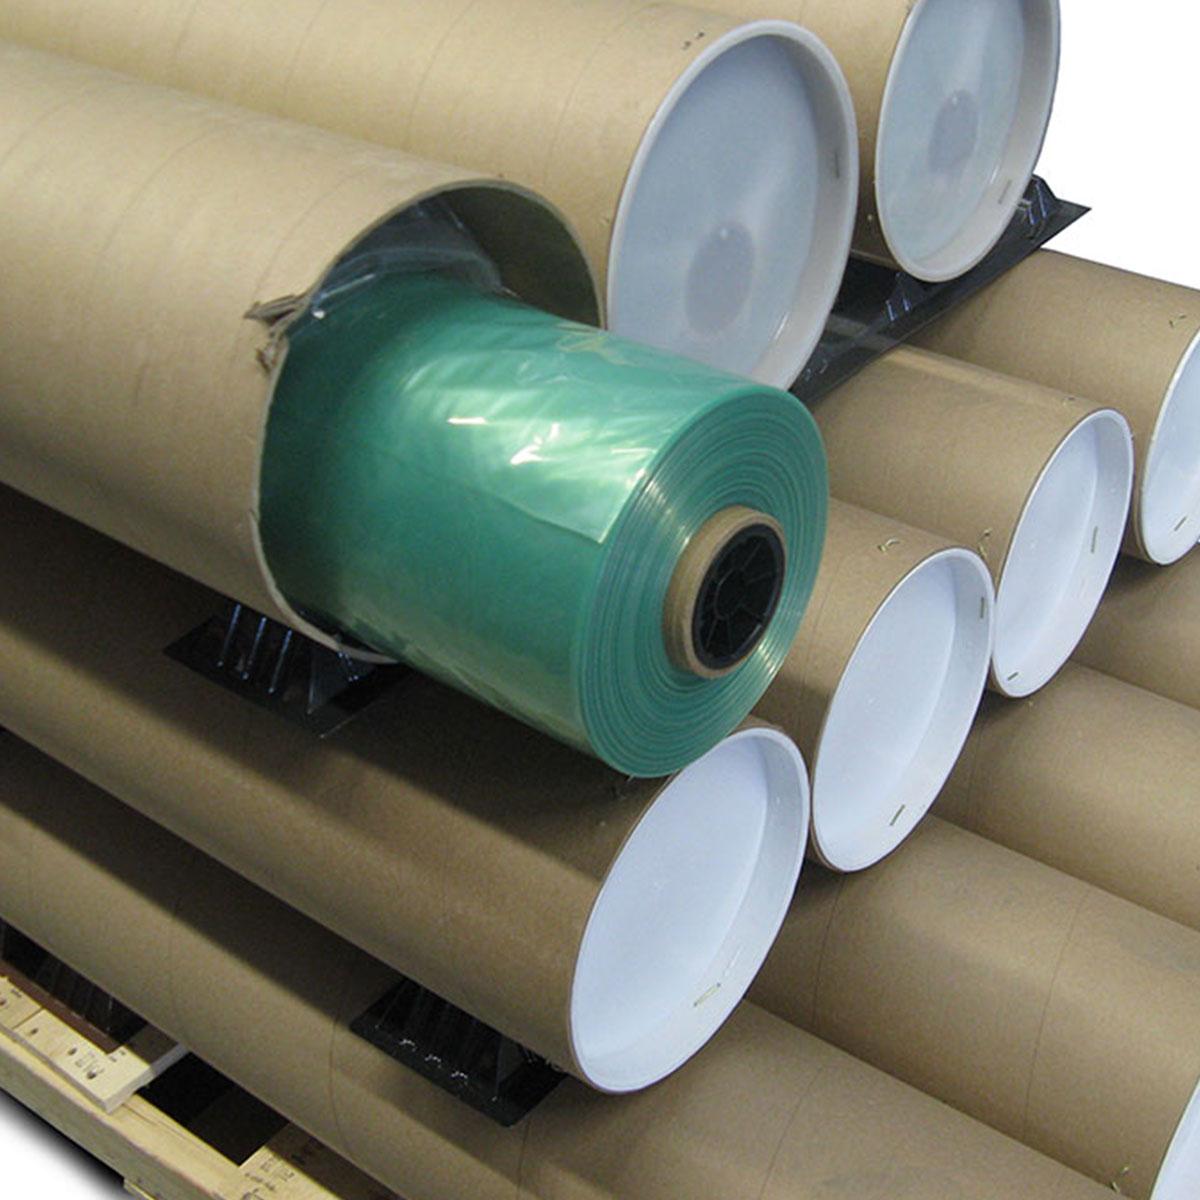 vakuum sack nylon 2000 grn 0076mm x 2000mm 600m 0003 x 80